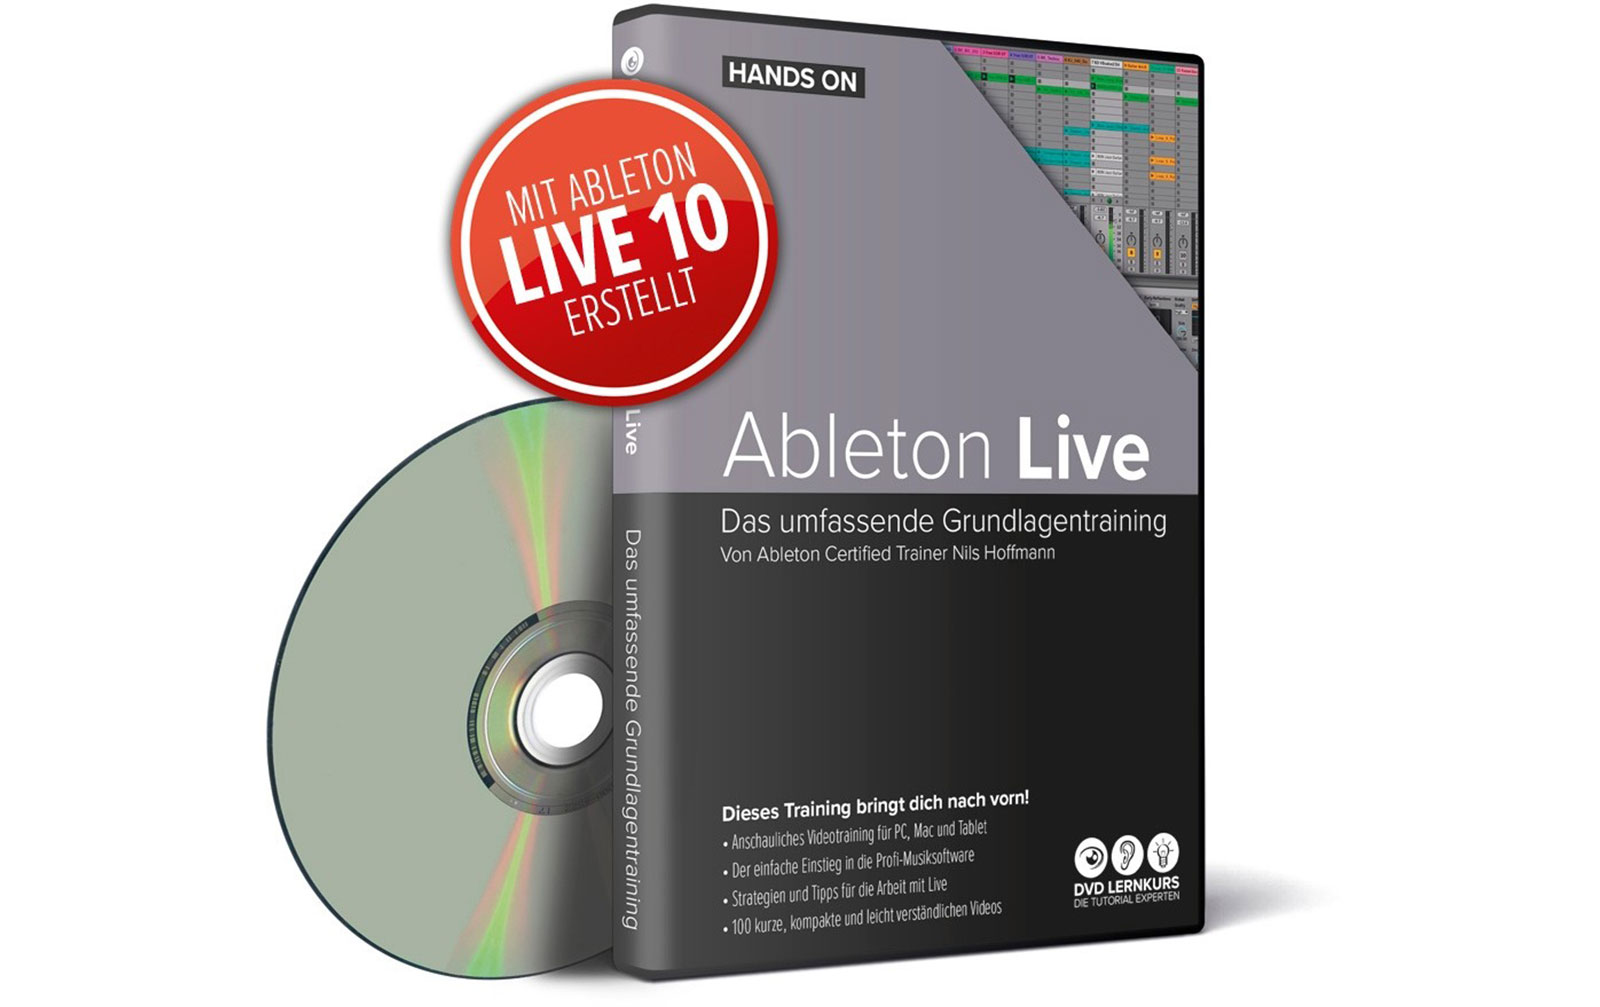 dvd-lernkurs-ableton-live-grundlagentraining